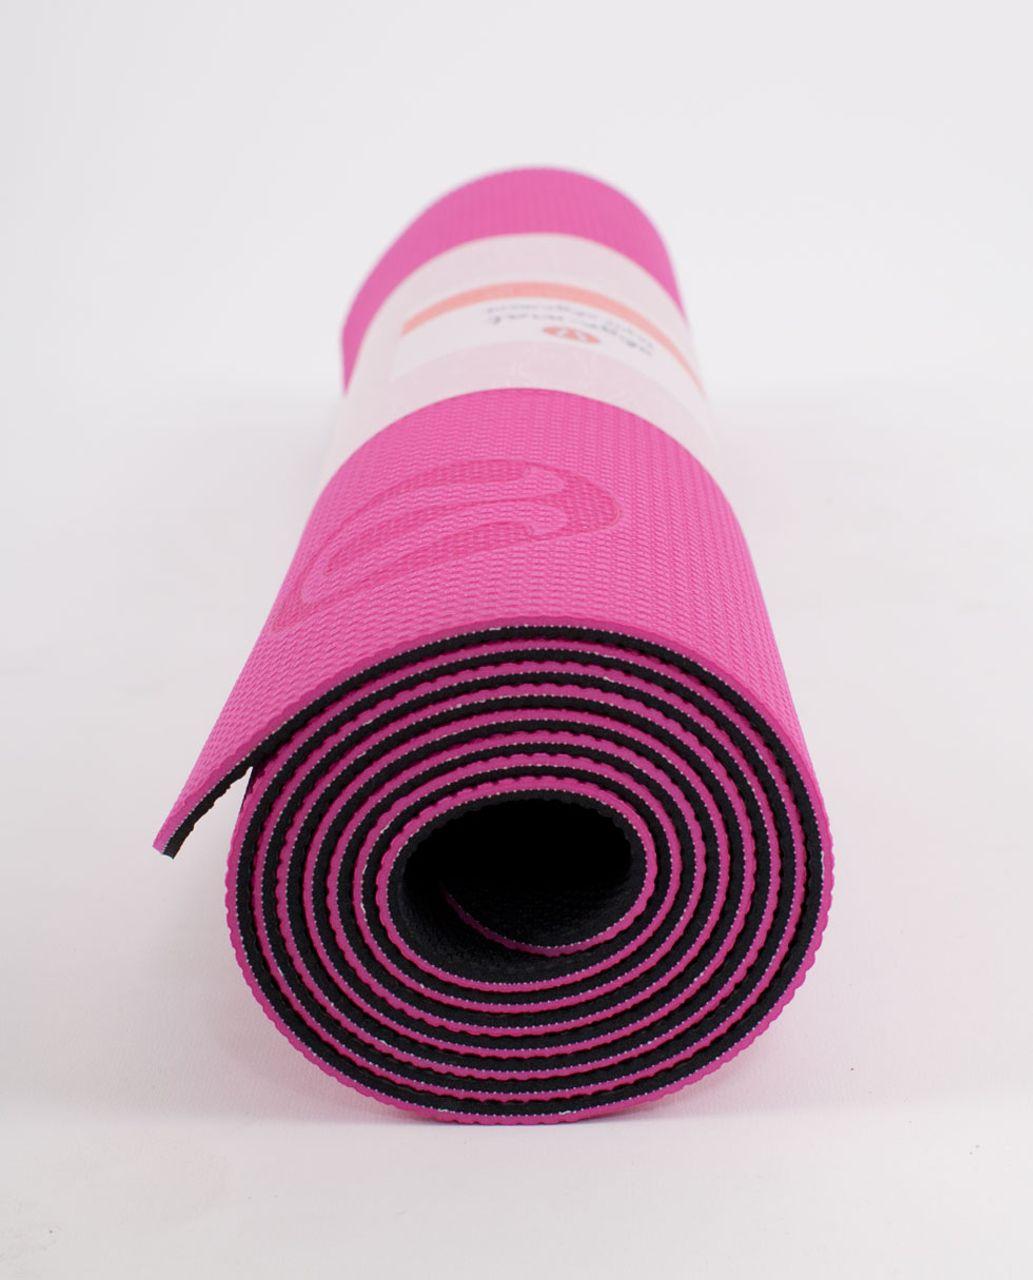 Lululemon Align Ultra Mat - Paris Pink /  Deep Coal